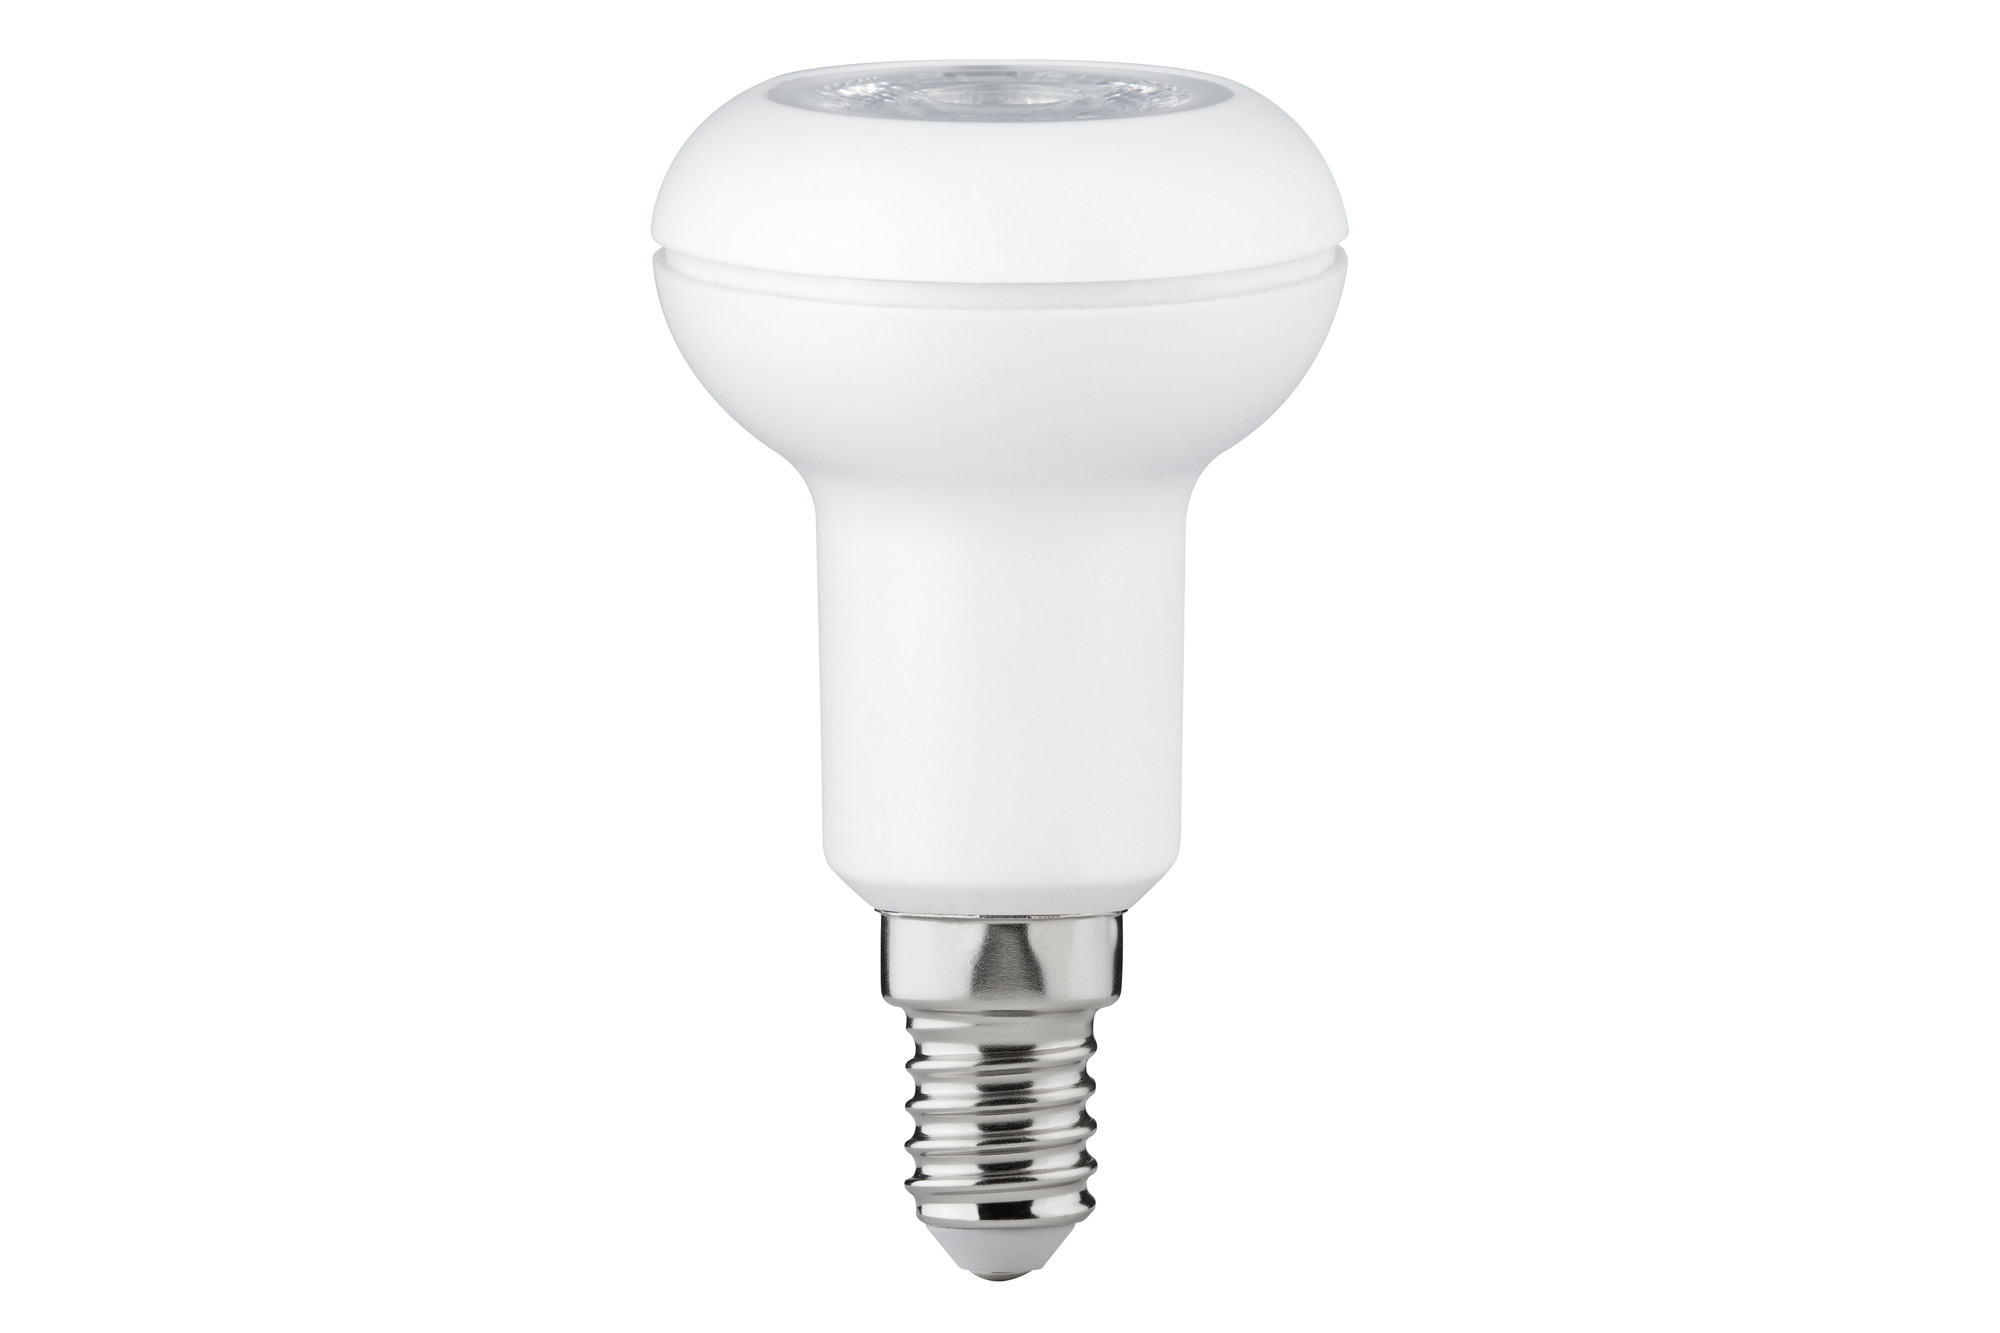 led reflektorlampe r50 3 5 w warmwei 28460. Black Bedroom Furniture Sets. Home Design Ideas